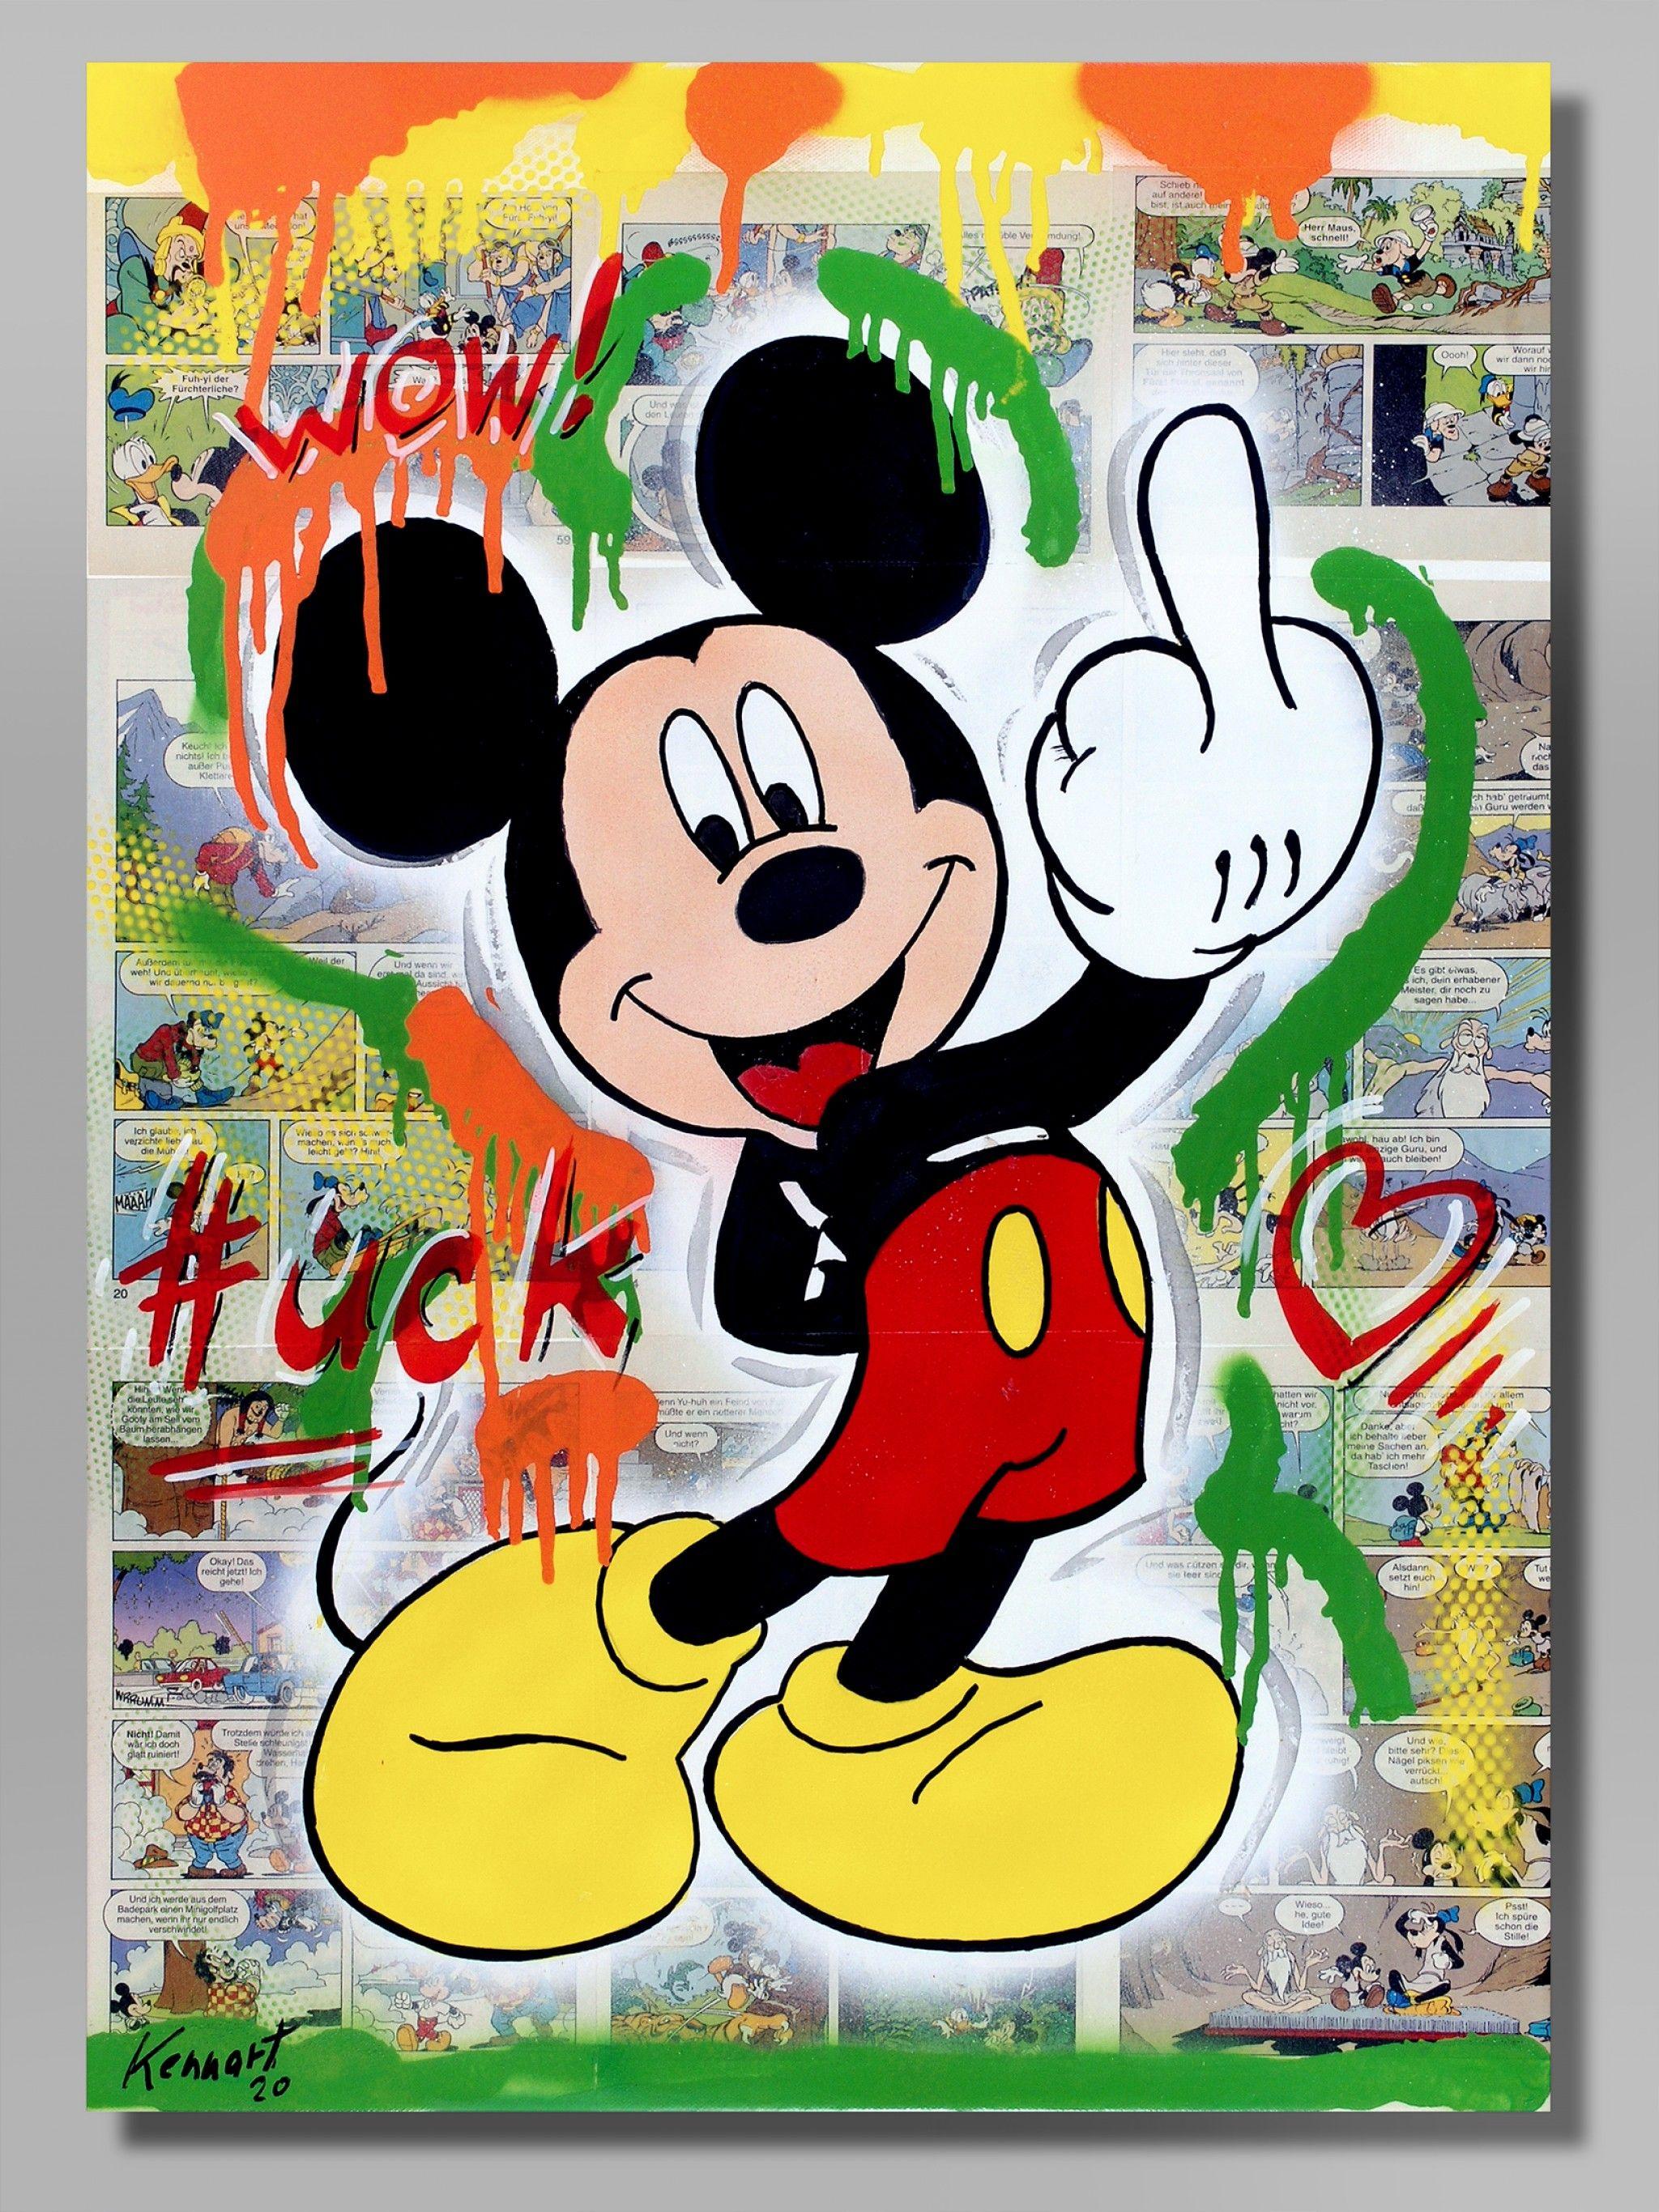 Street Art Uck Artpop Kunstproduktion Original Gemälde